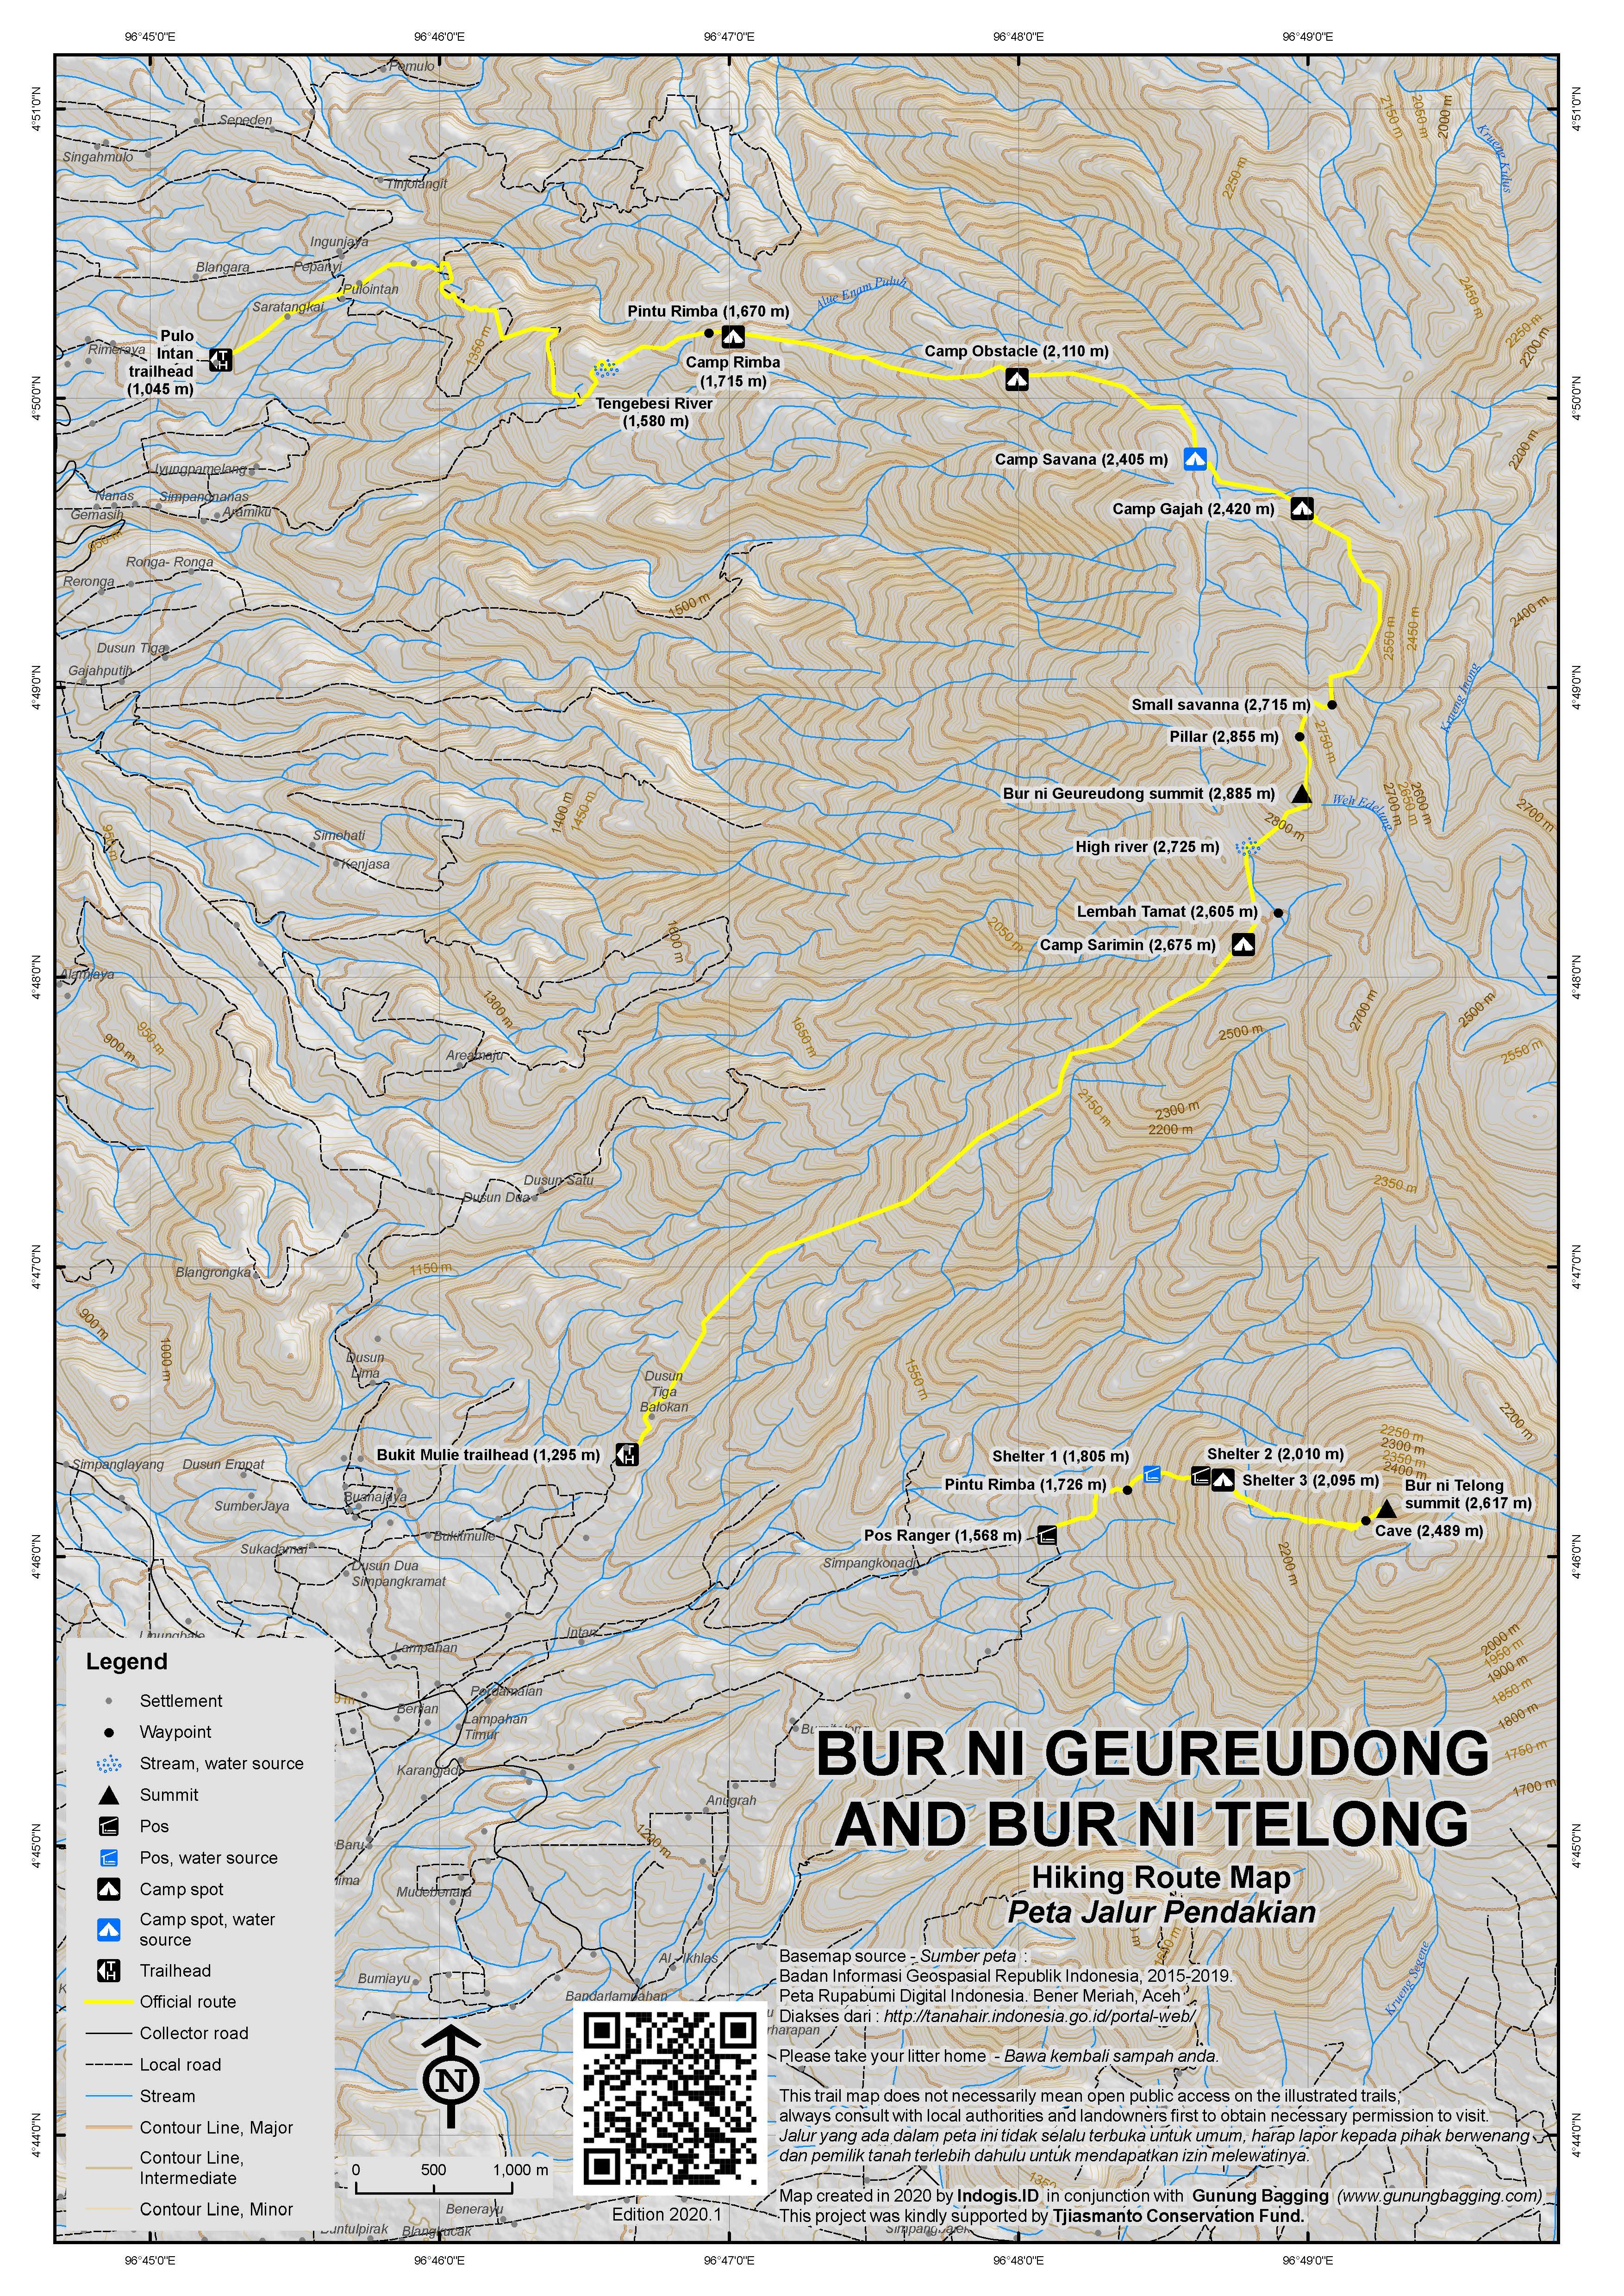 Peta Jalur Pendakian Bur ni Geureudong